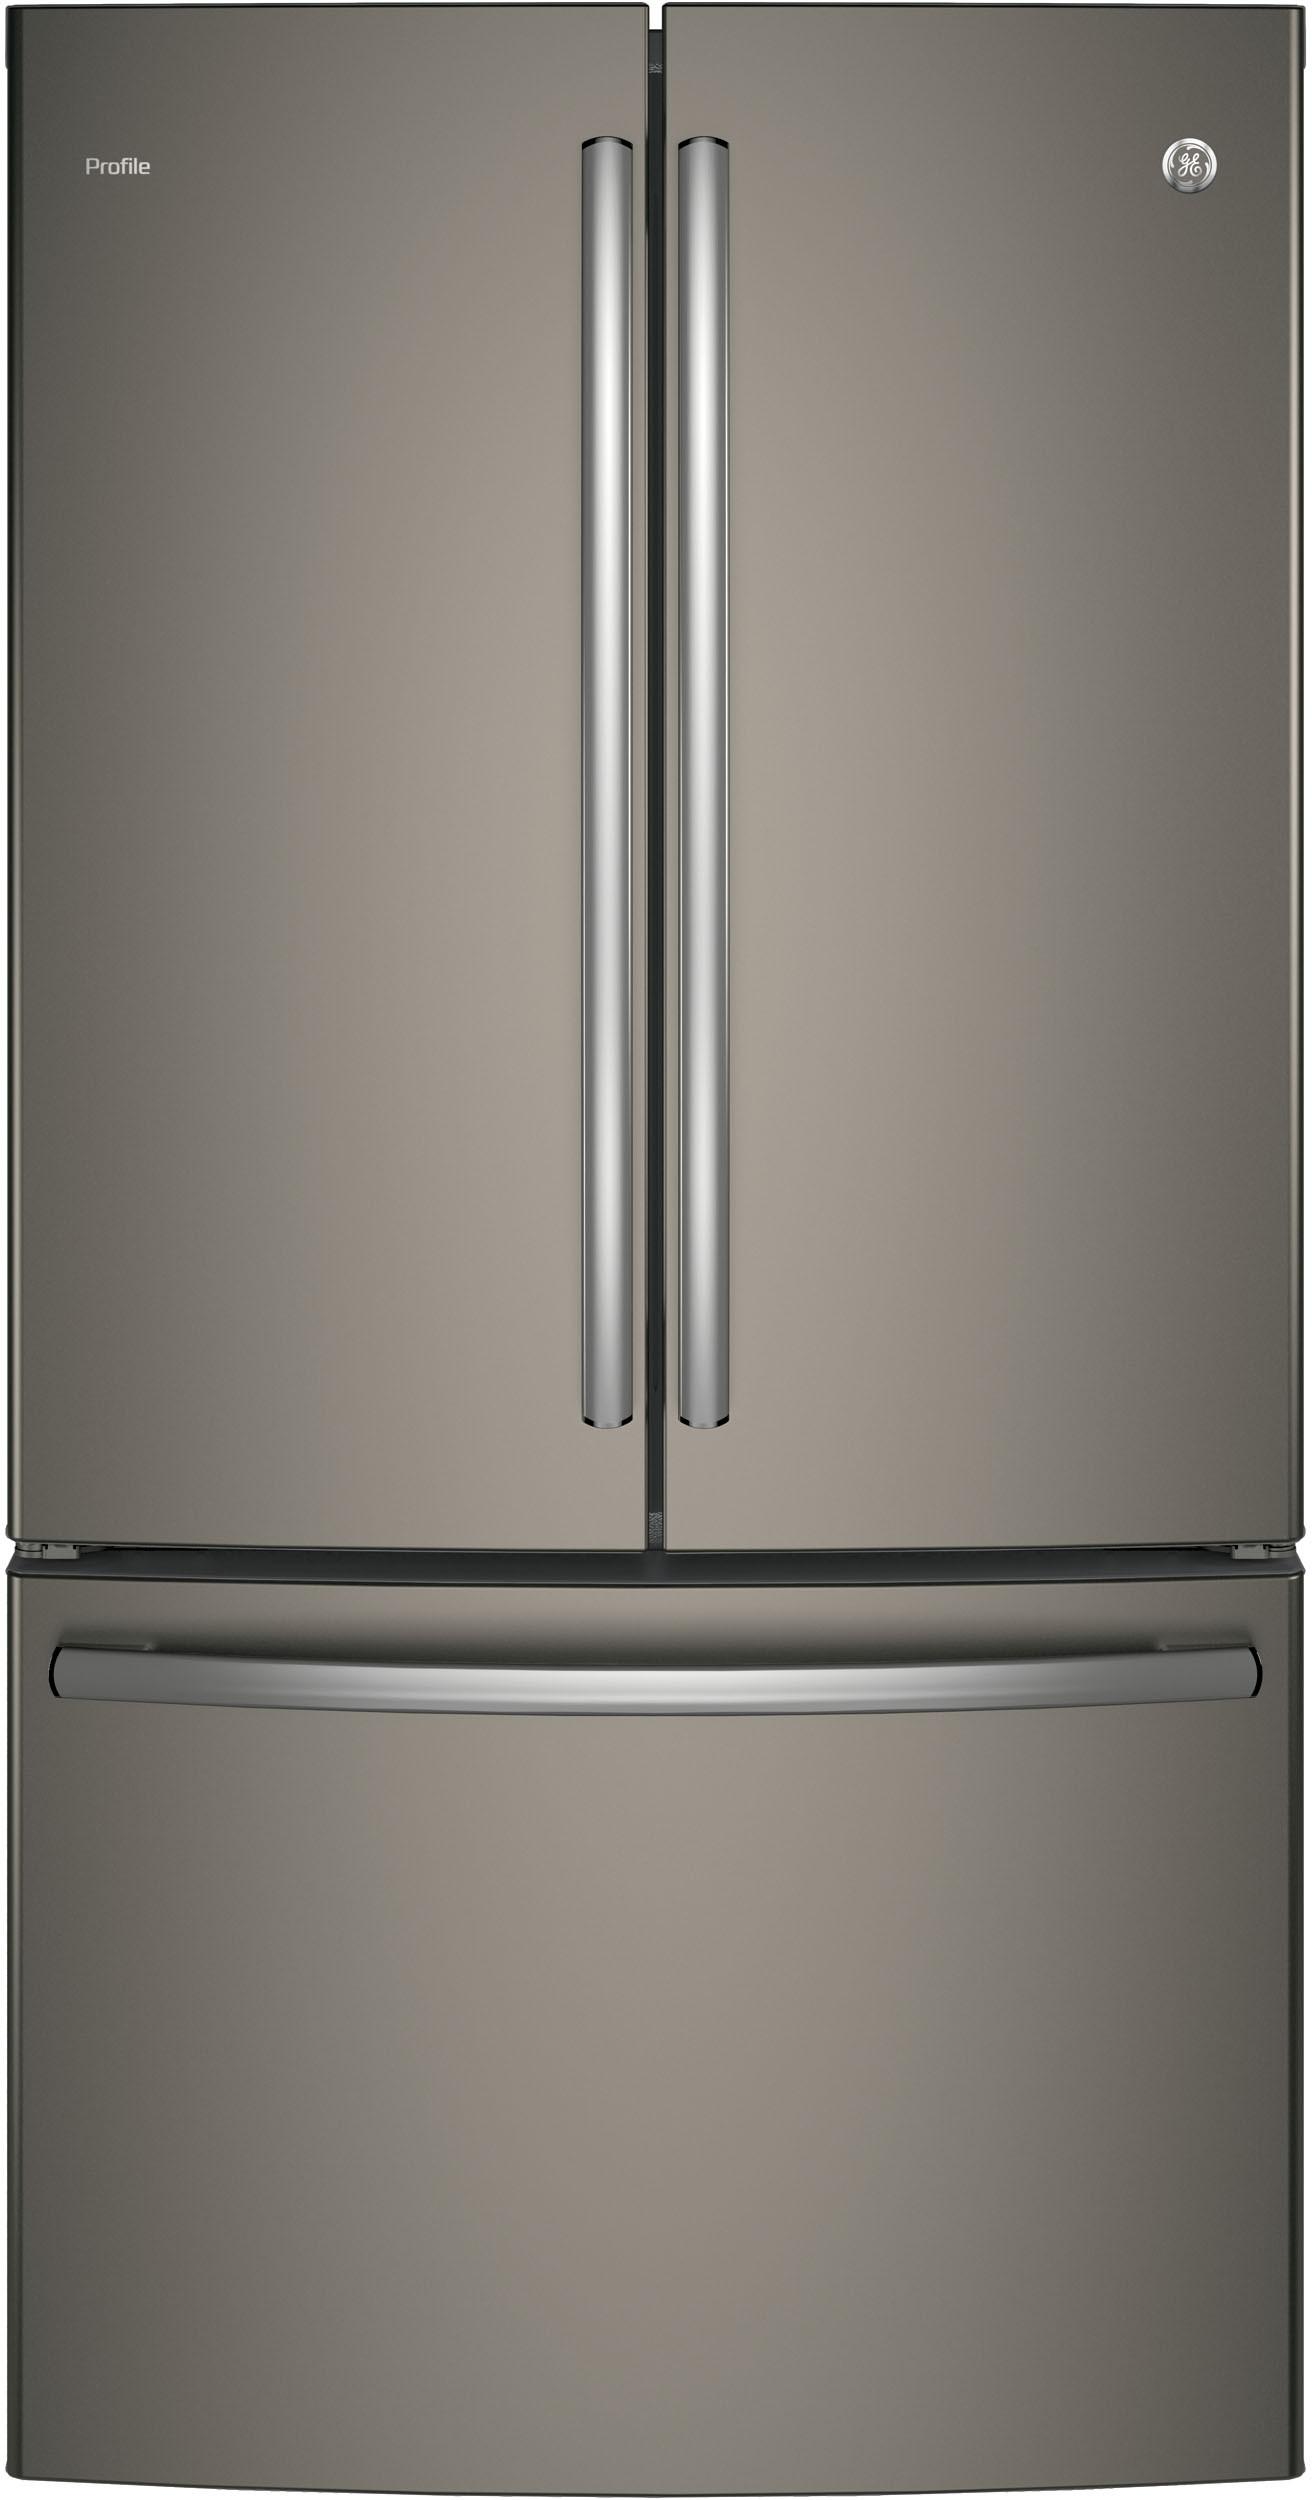 Water Dispenser Internal Refrigerators